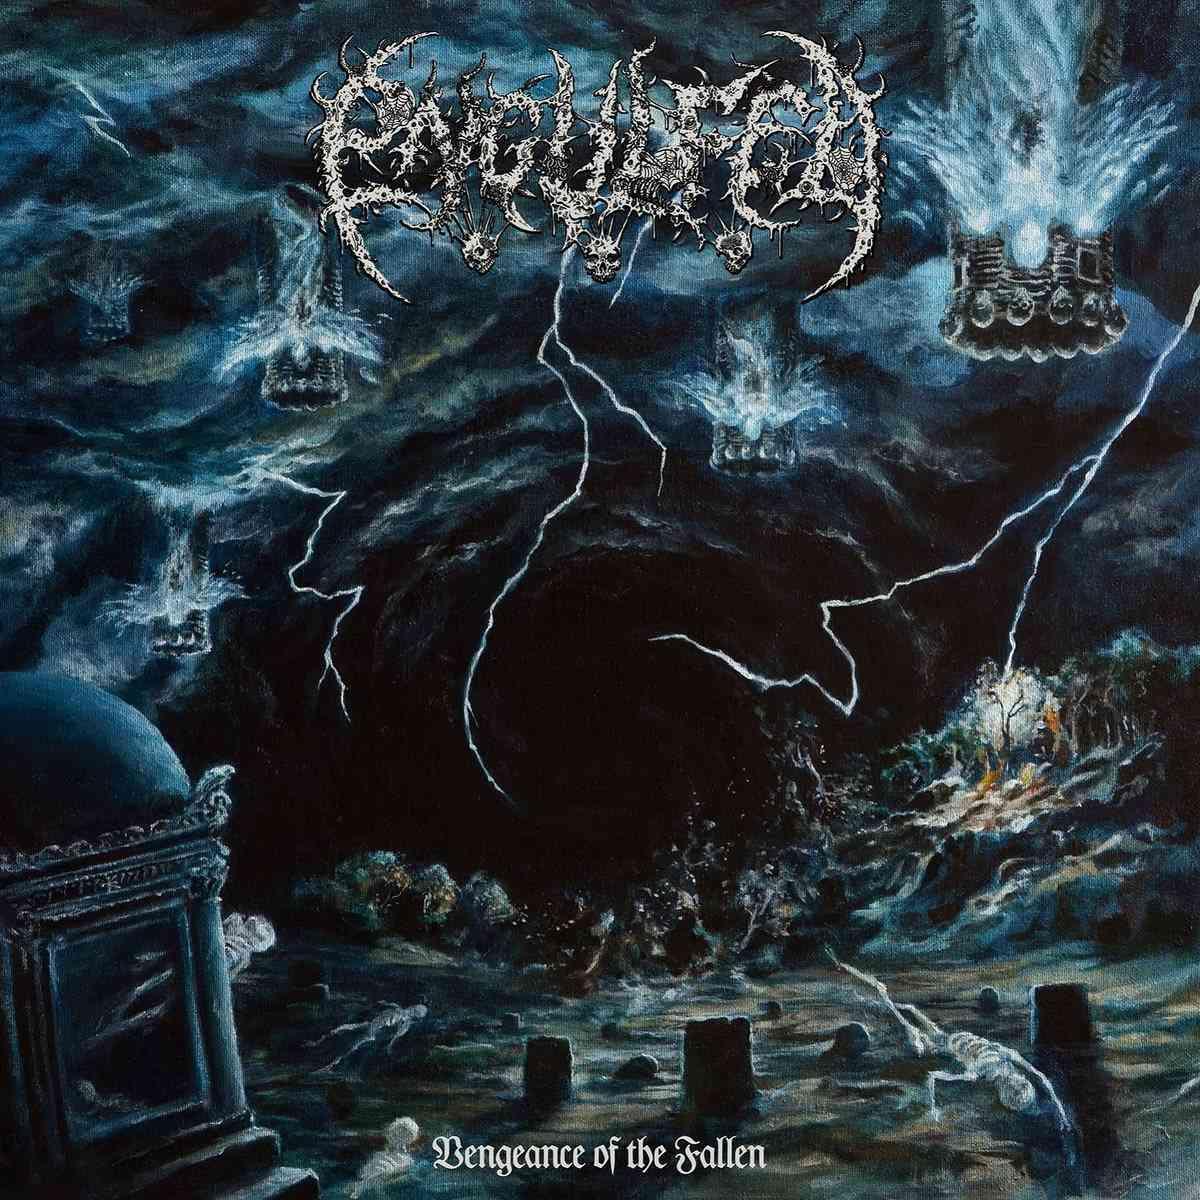 Engulfed - Vegeance Of The Fallen - album cover